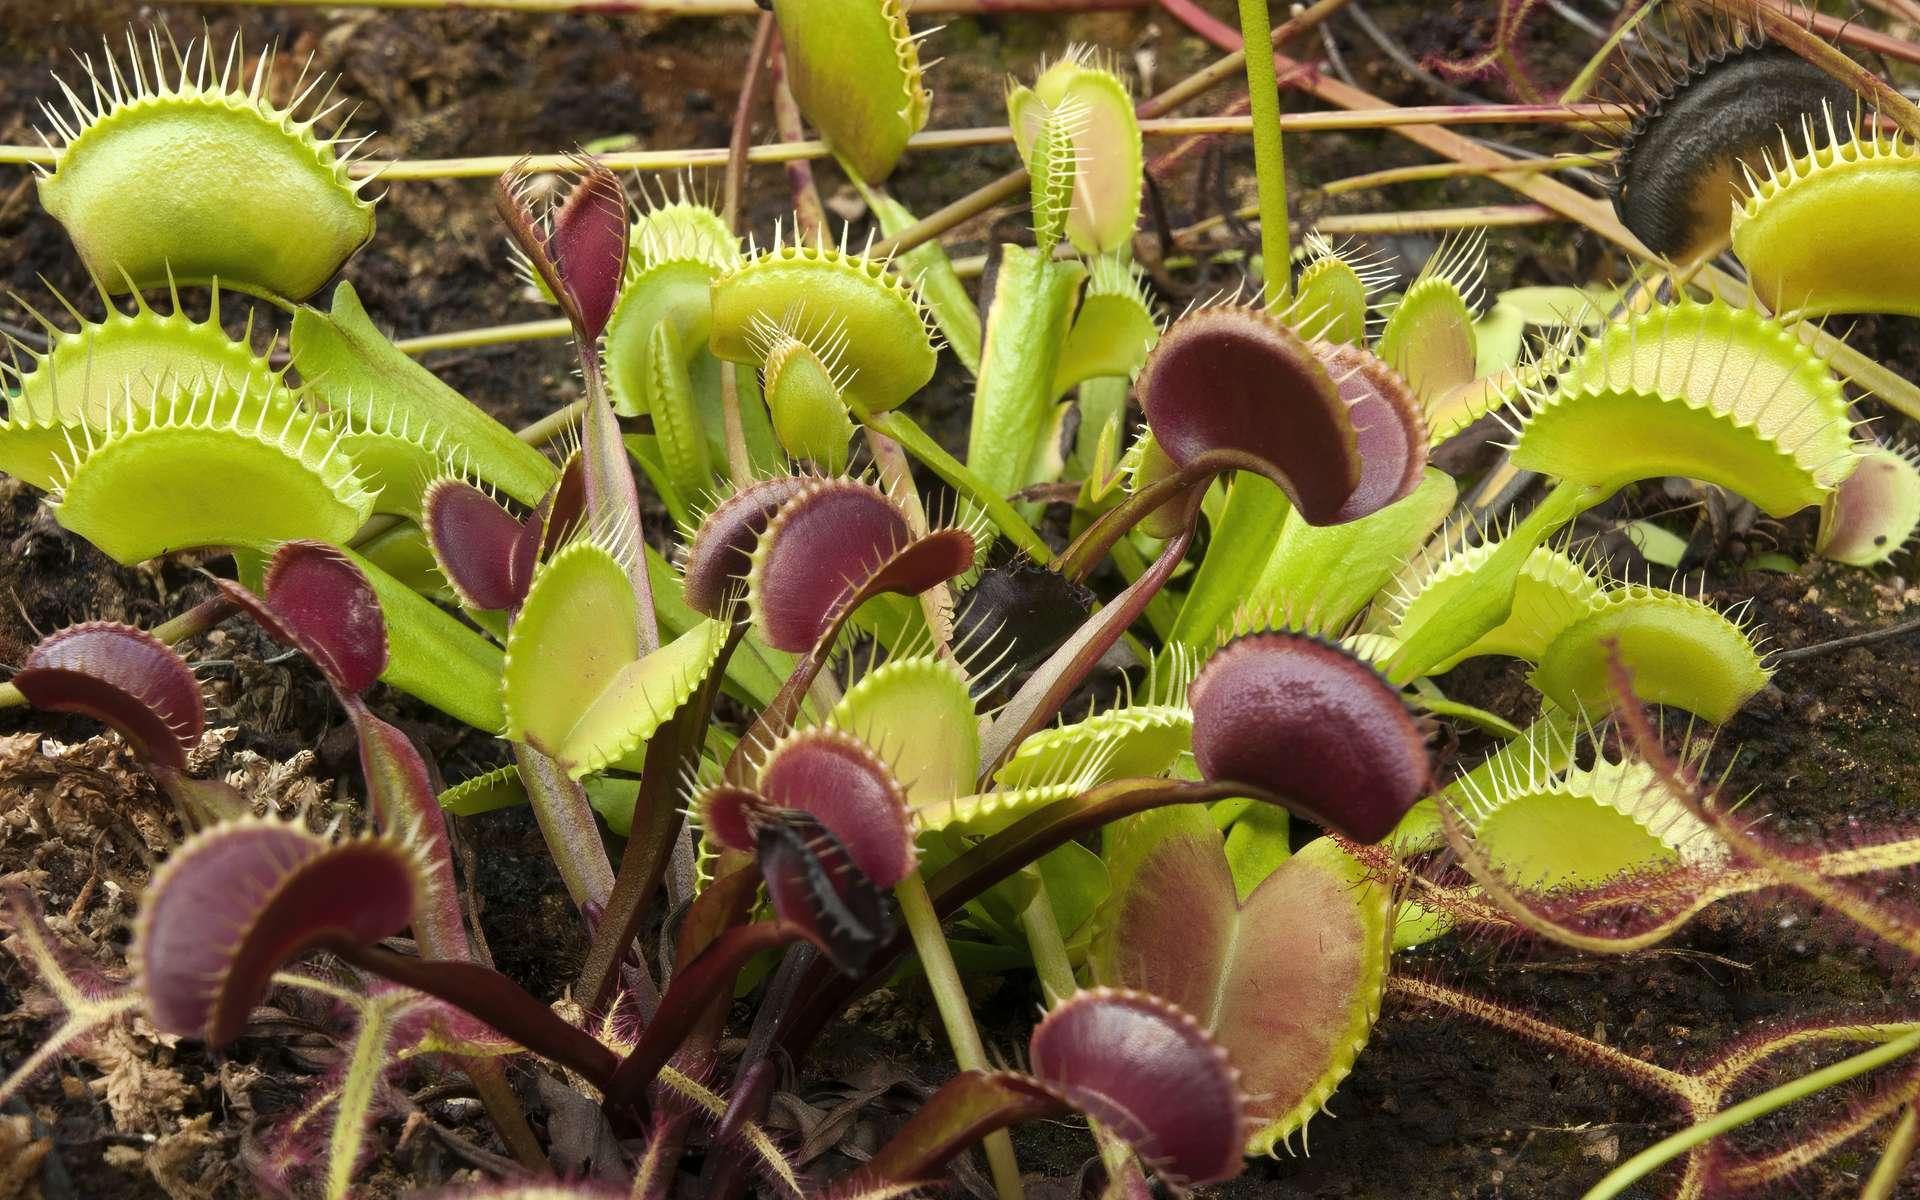 Cette plante carnivore produit son propre champ magnétique - Futura